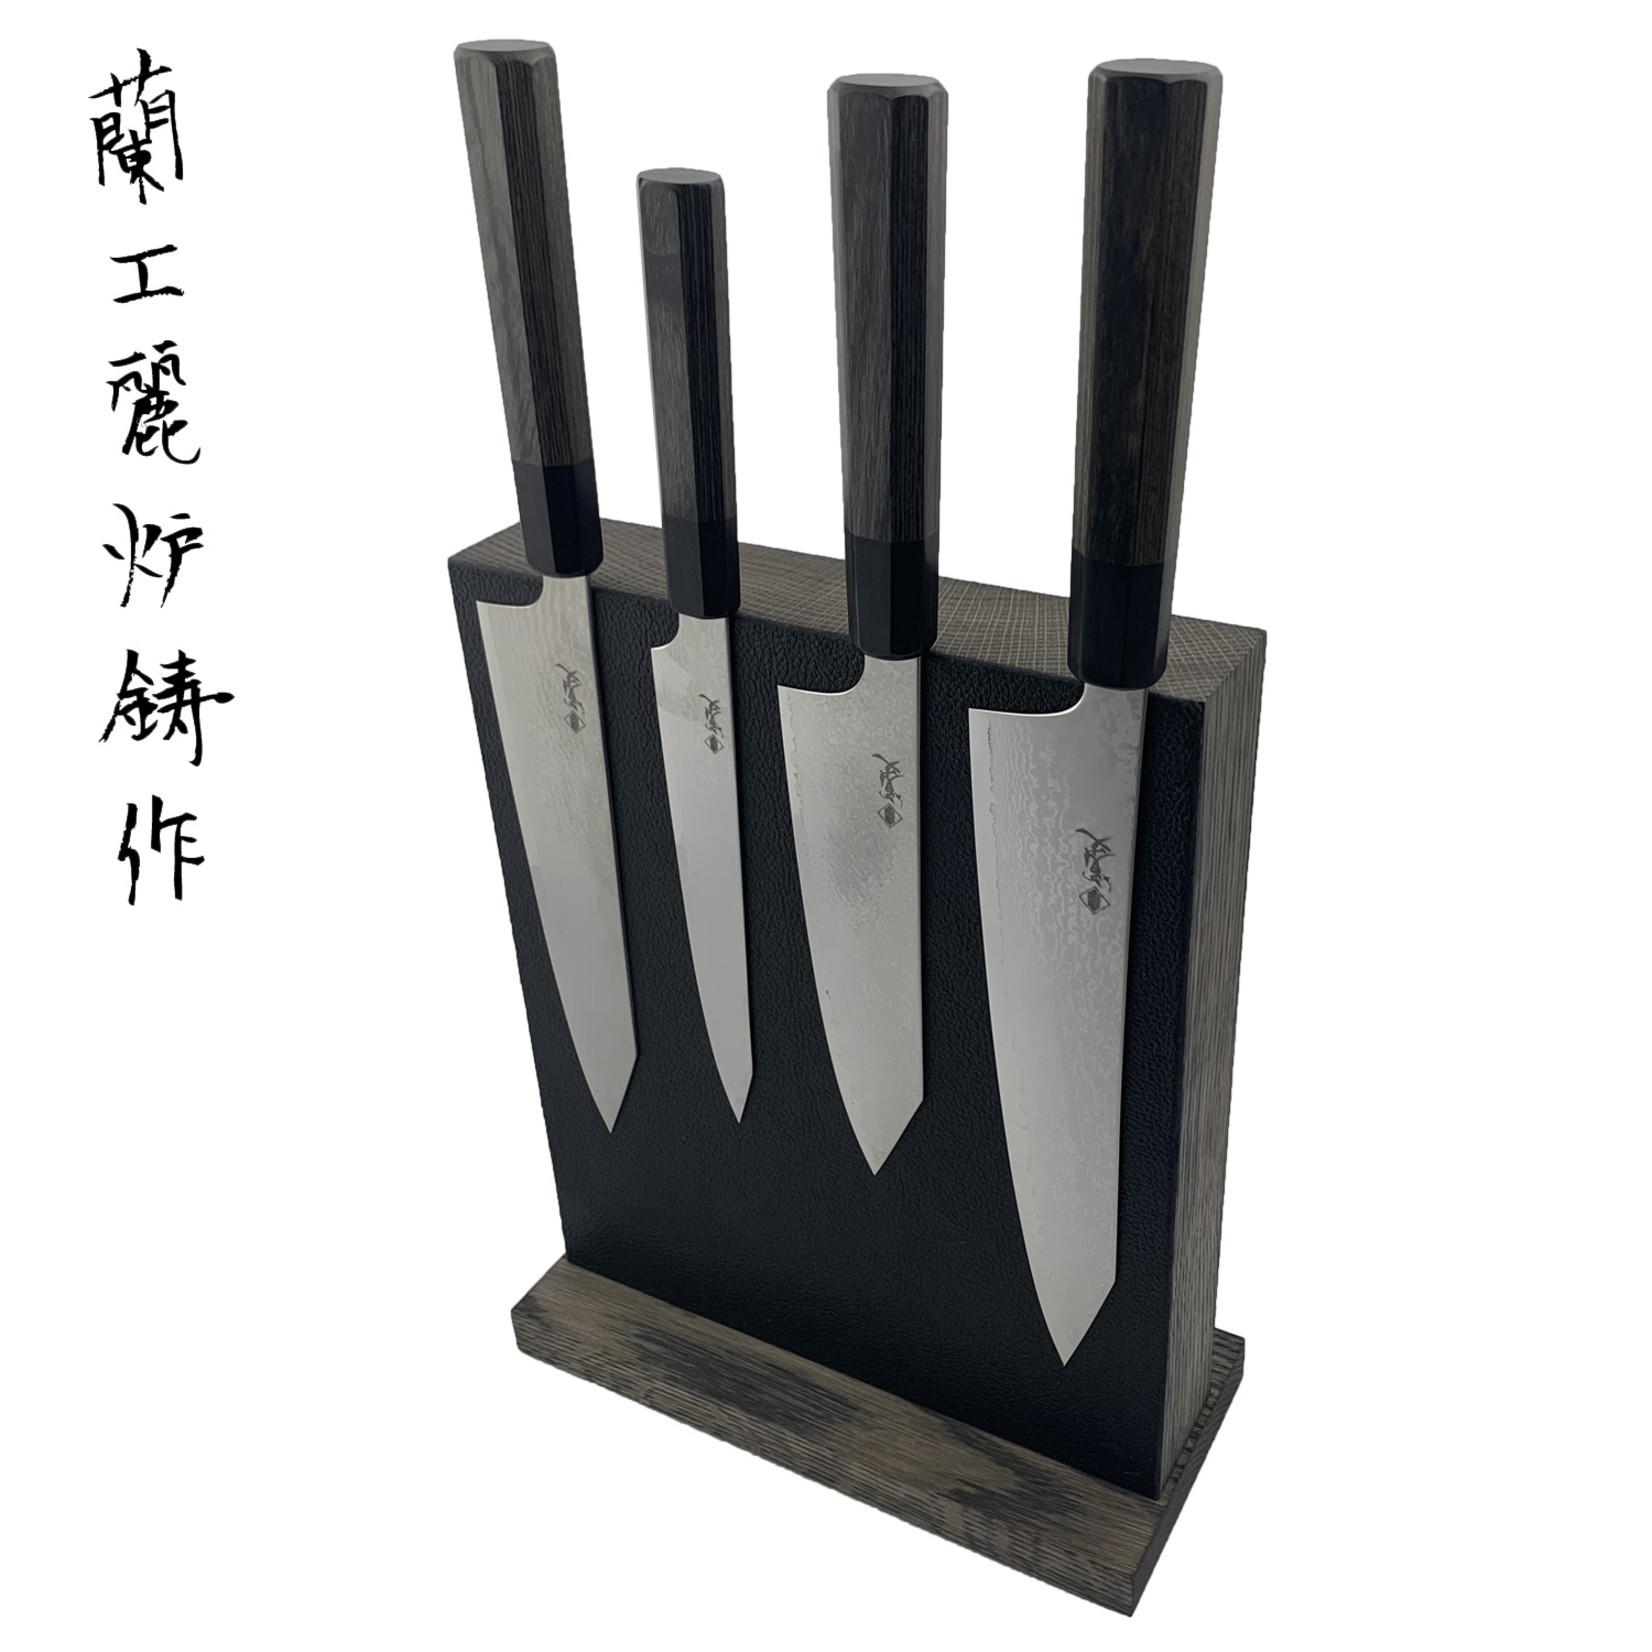 PIOTR THE BEAR knifestand 240 mm black leather